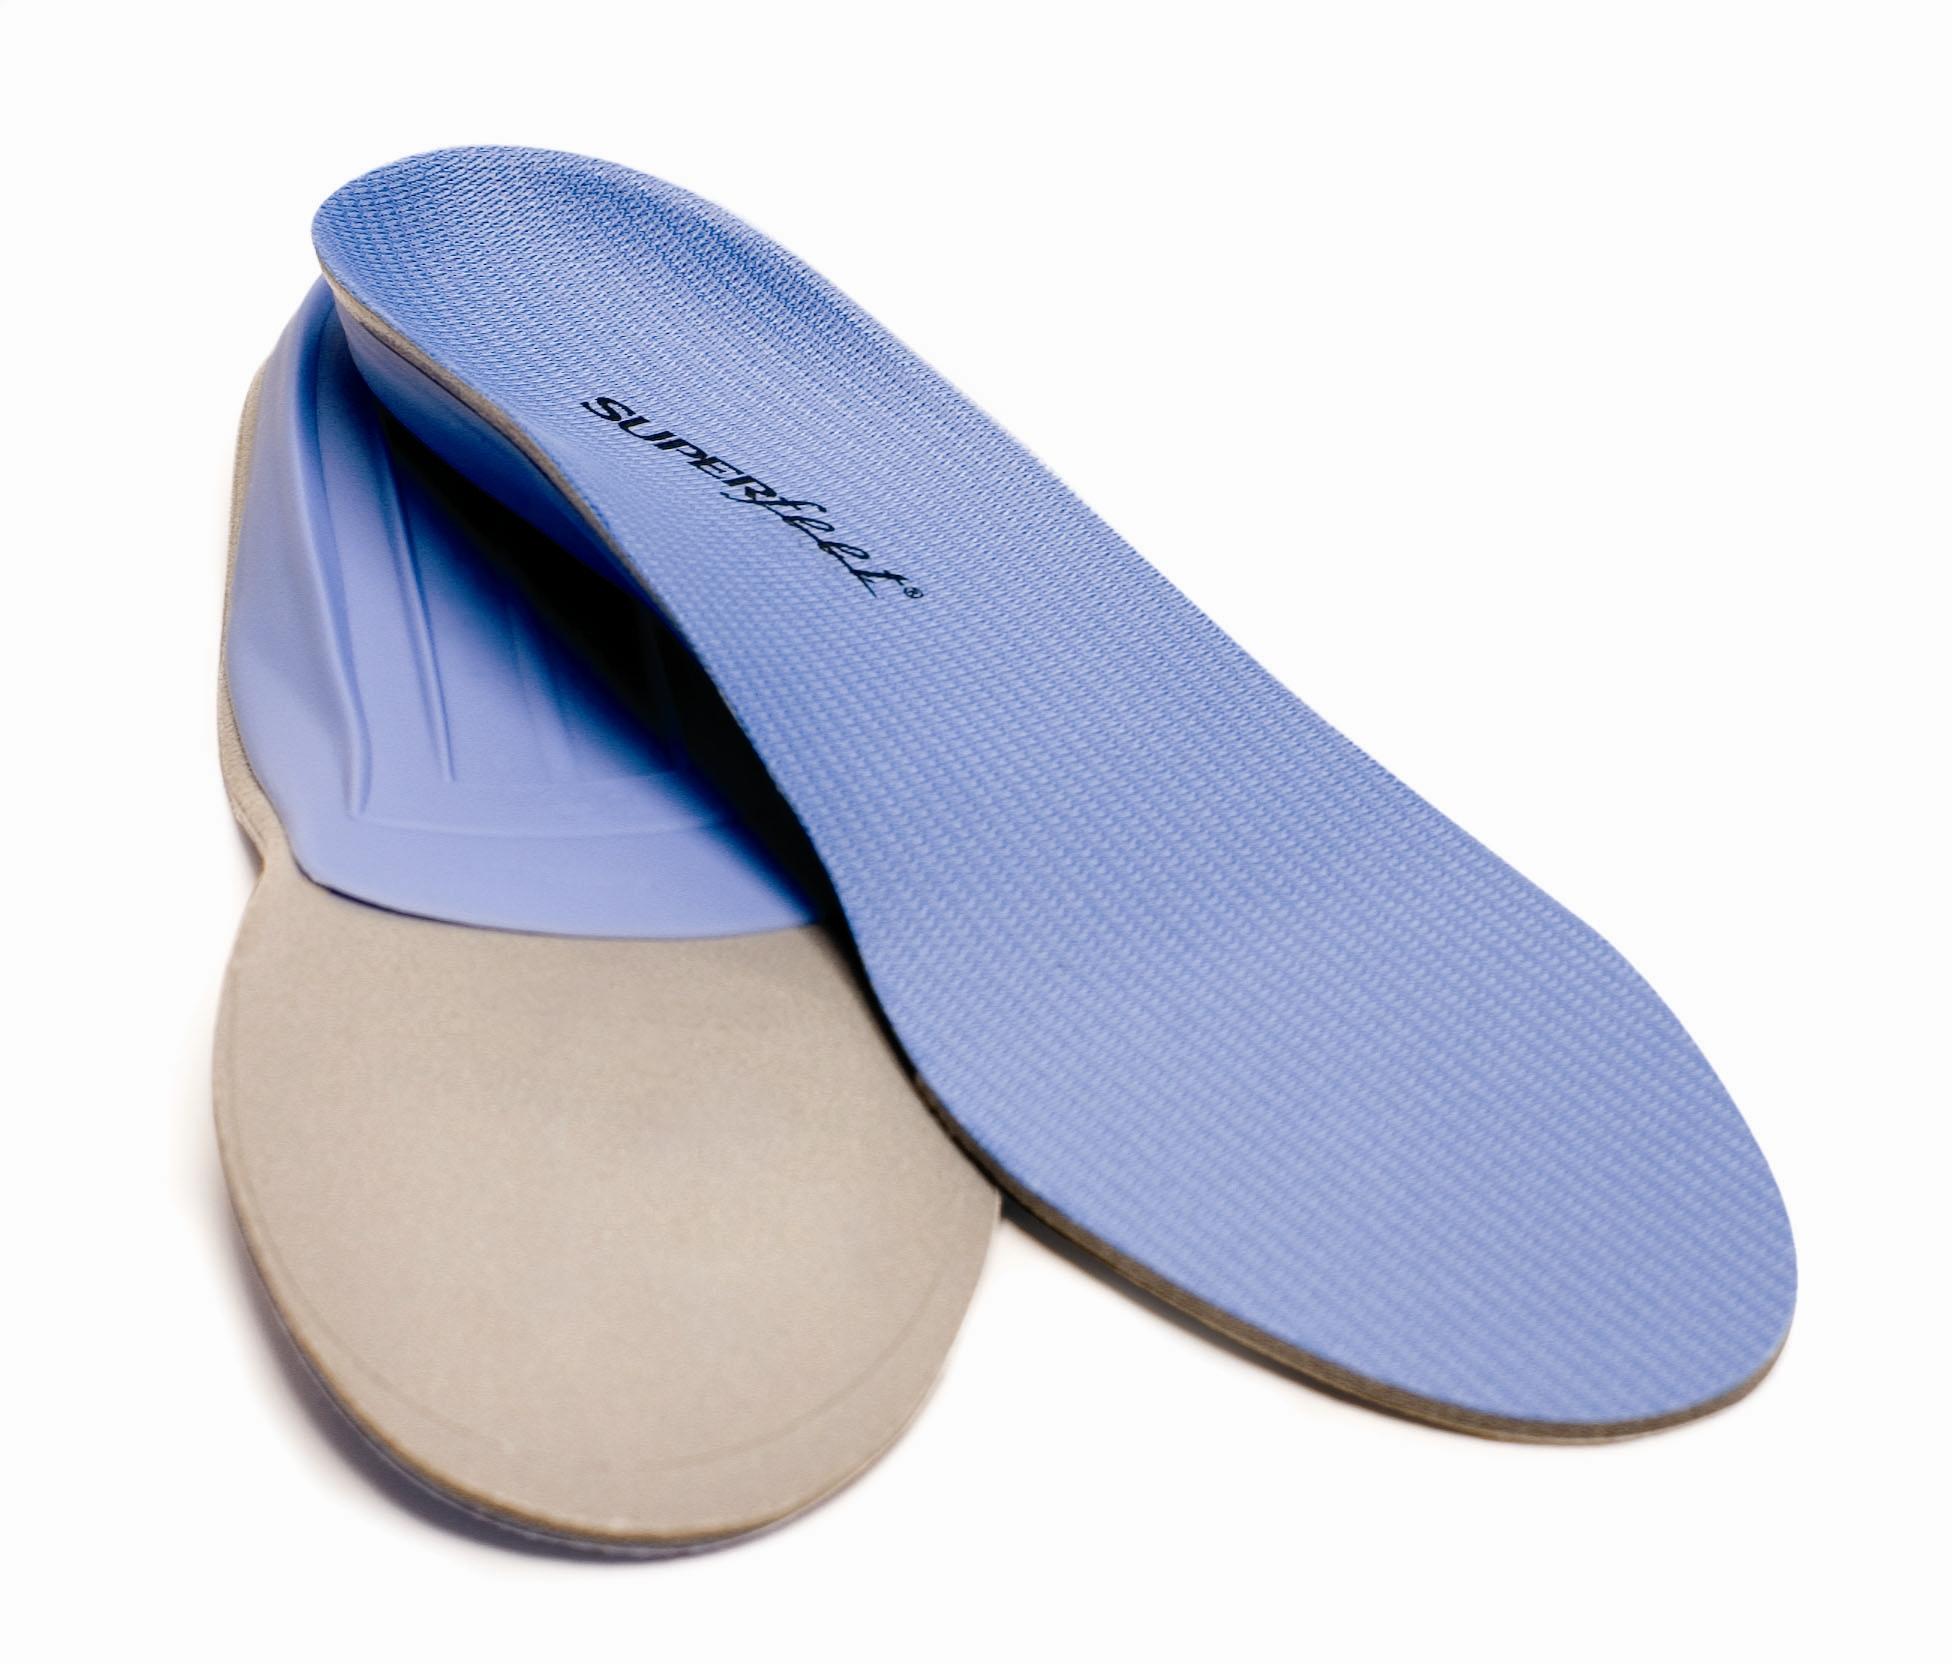 Univerzálne vložky do topánok - Superfeet BLUE